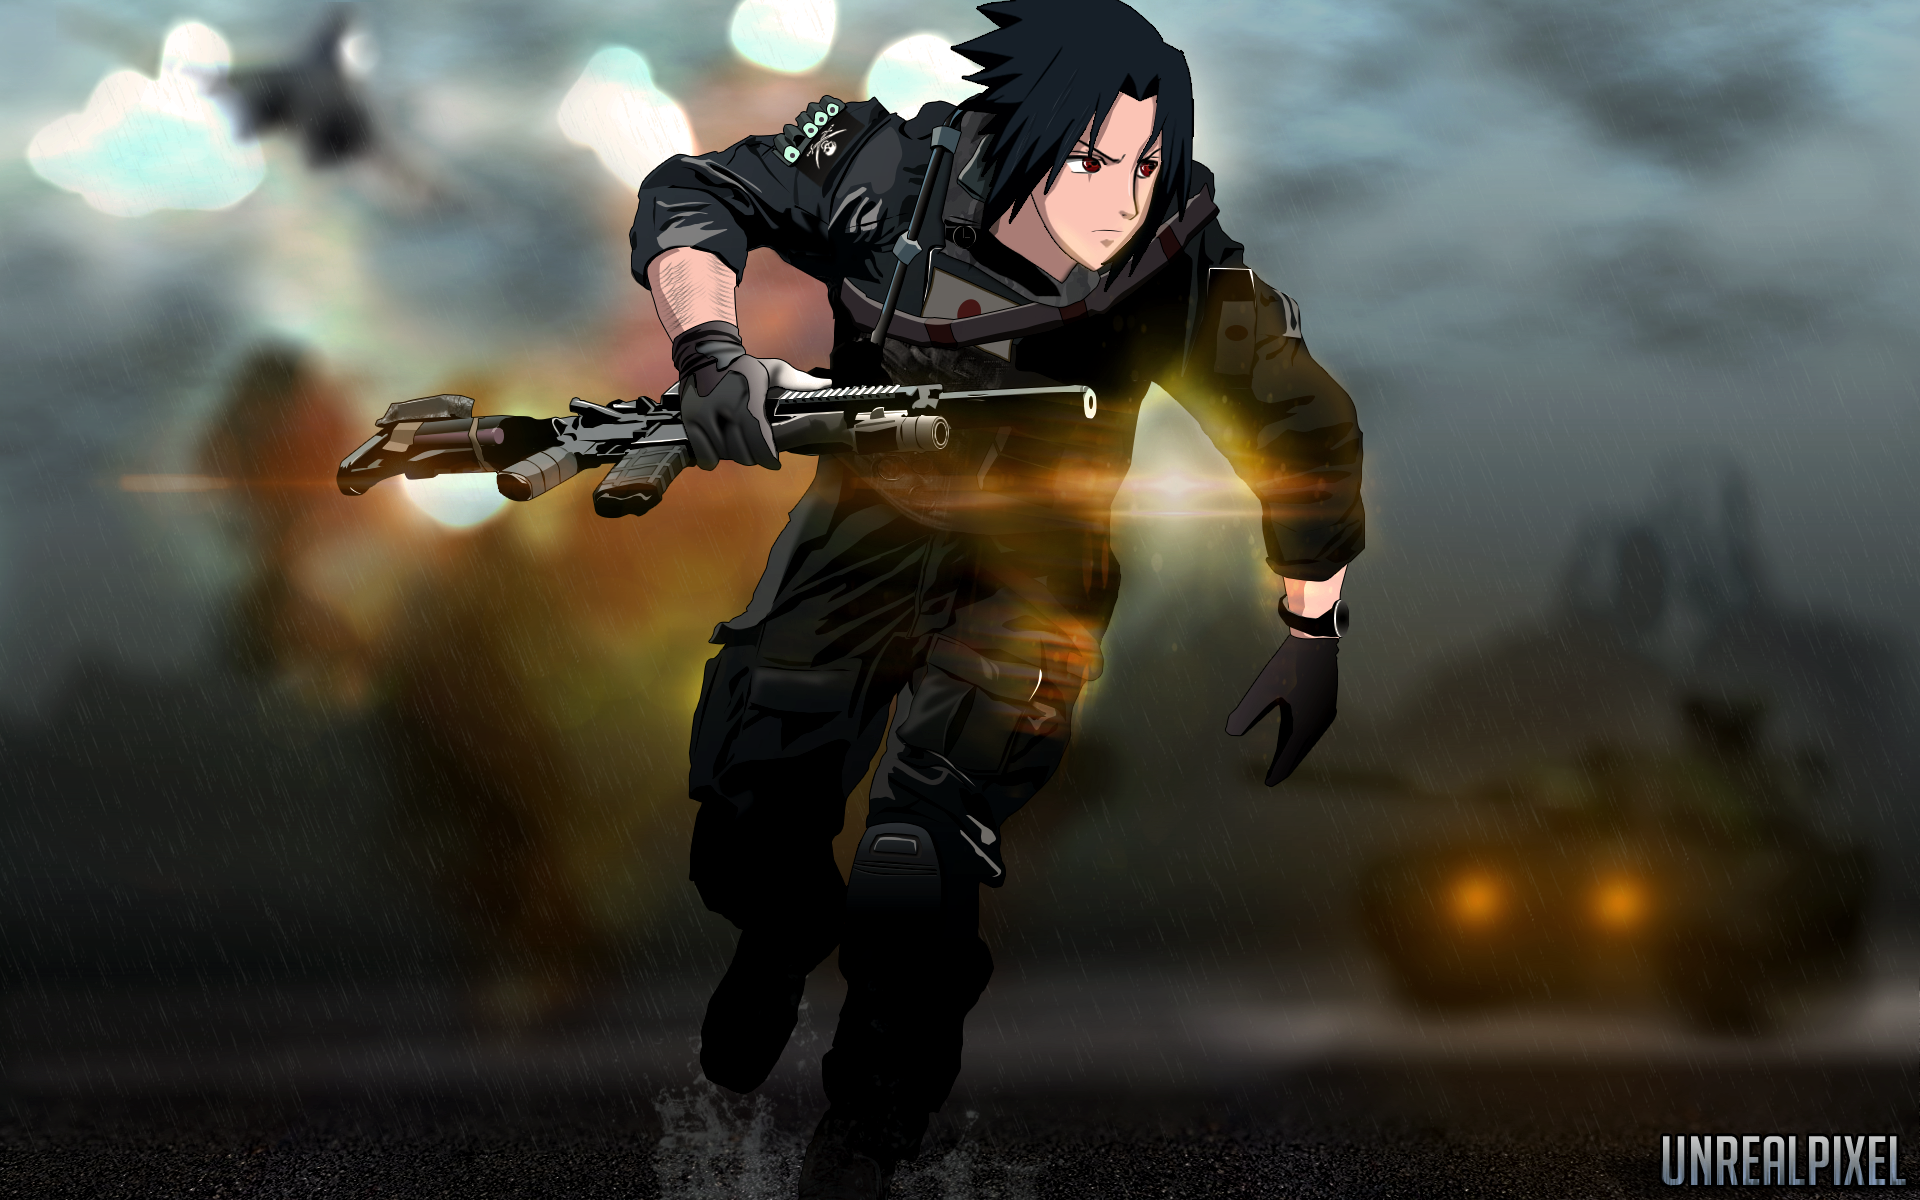 Sasuke in battlefield 4s cover by unrealpixel on deviantart sasuke in battlefield 4s cover by unrealpixel voltagebd Gallery